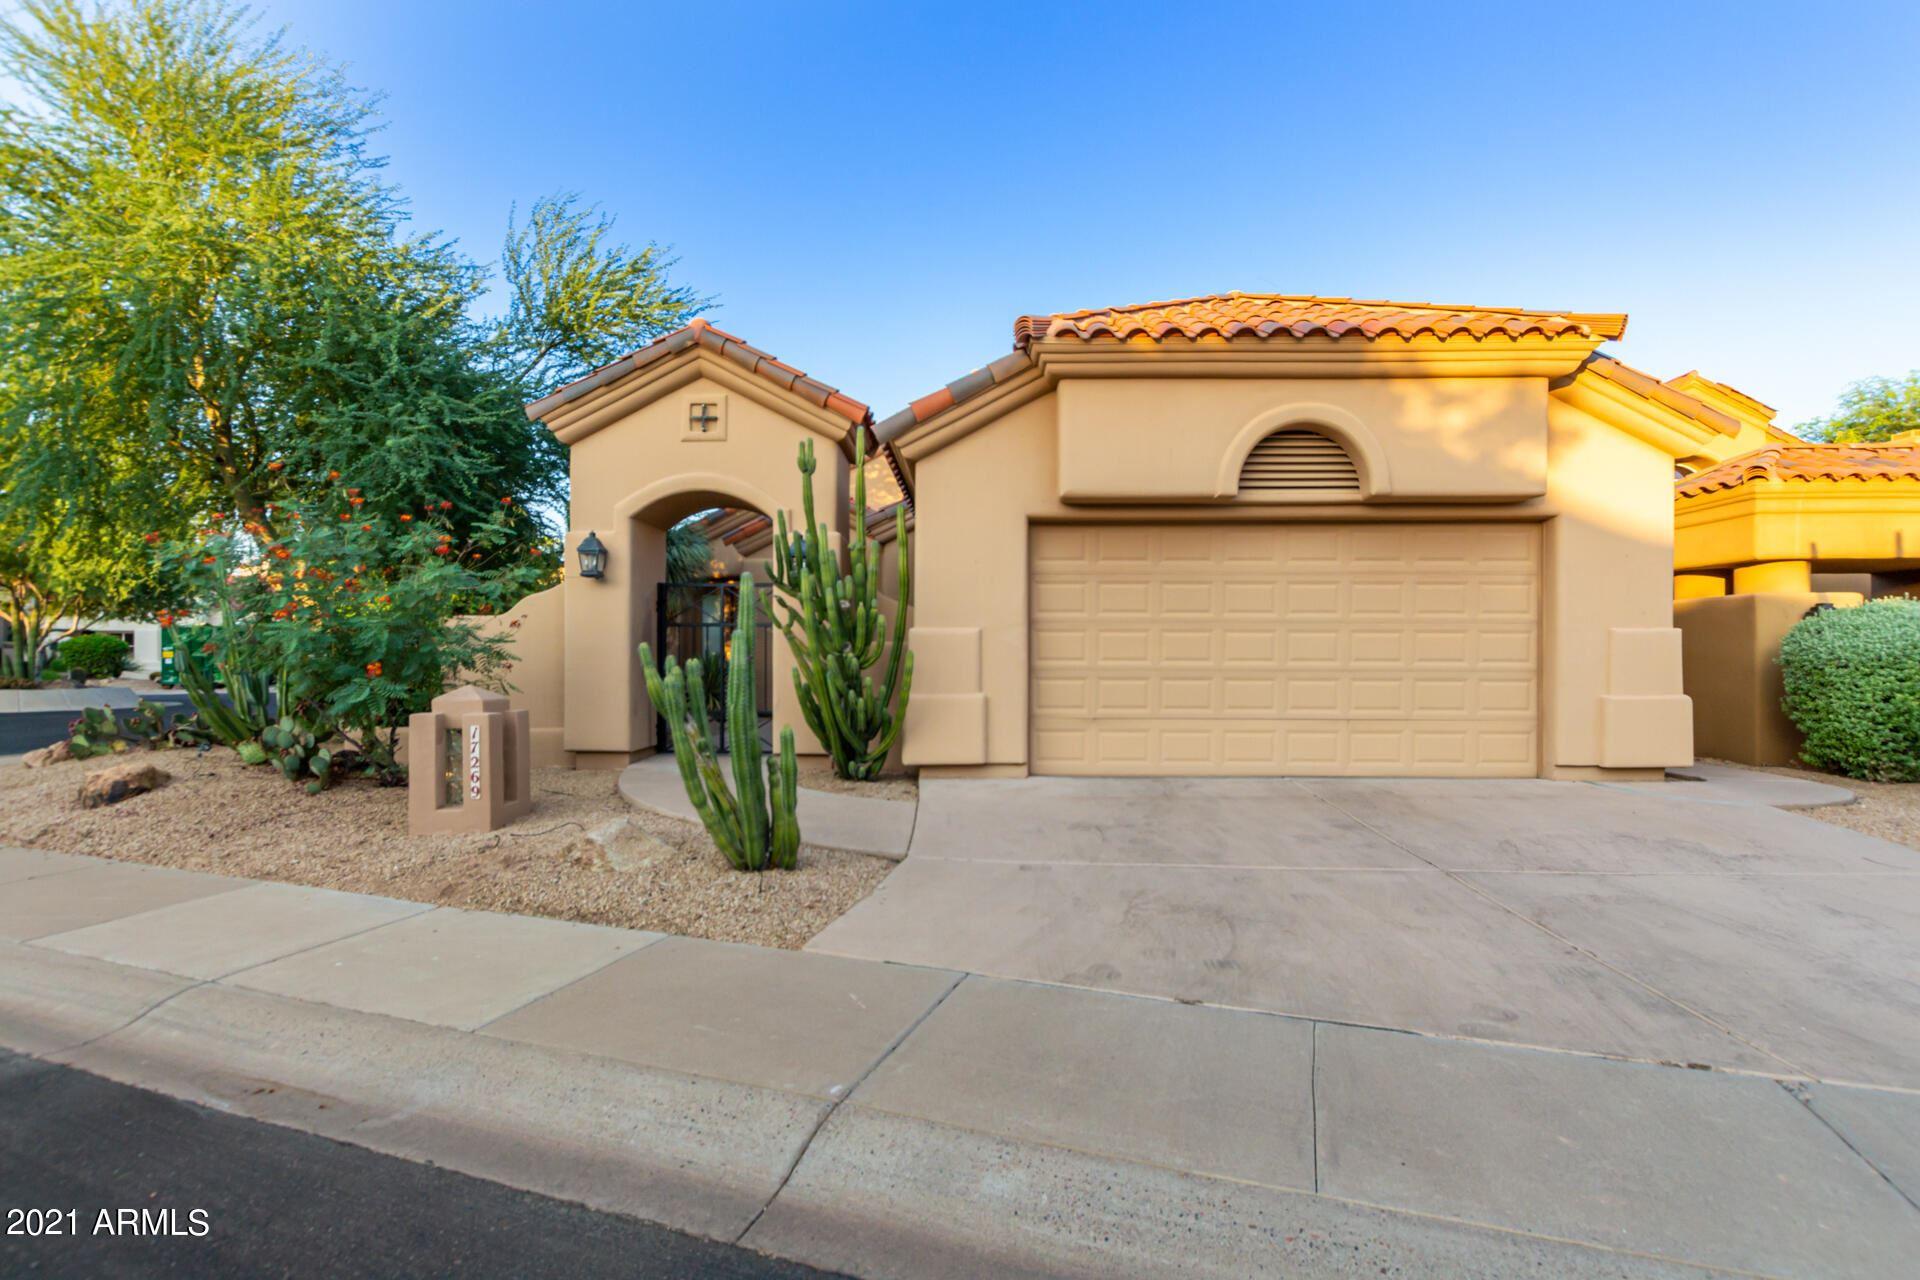 17269 N 79TH Street, Scottsdale, AZ 85255 - MLS#: 6297676